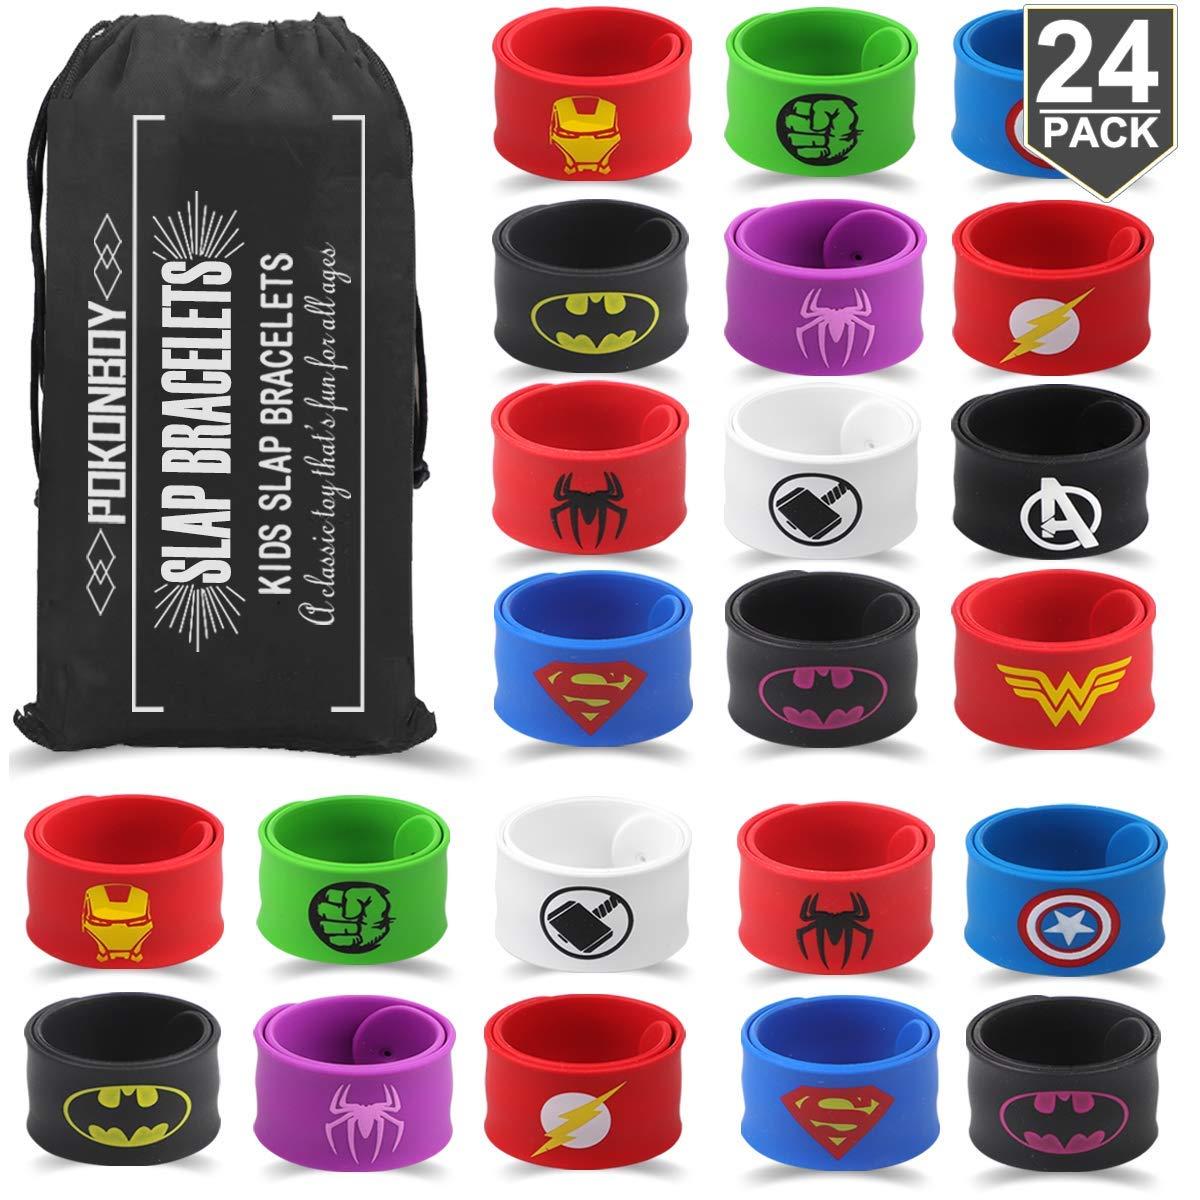 POKONBOY Superhero Slap Bracelets for Kids Party favors - 24 Pack Slap Bracelets for Boys Girls Kids Super Hero Birthday Party Favors Supplies Carnival Boys Prizes by POKONBOY